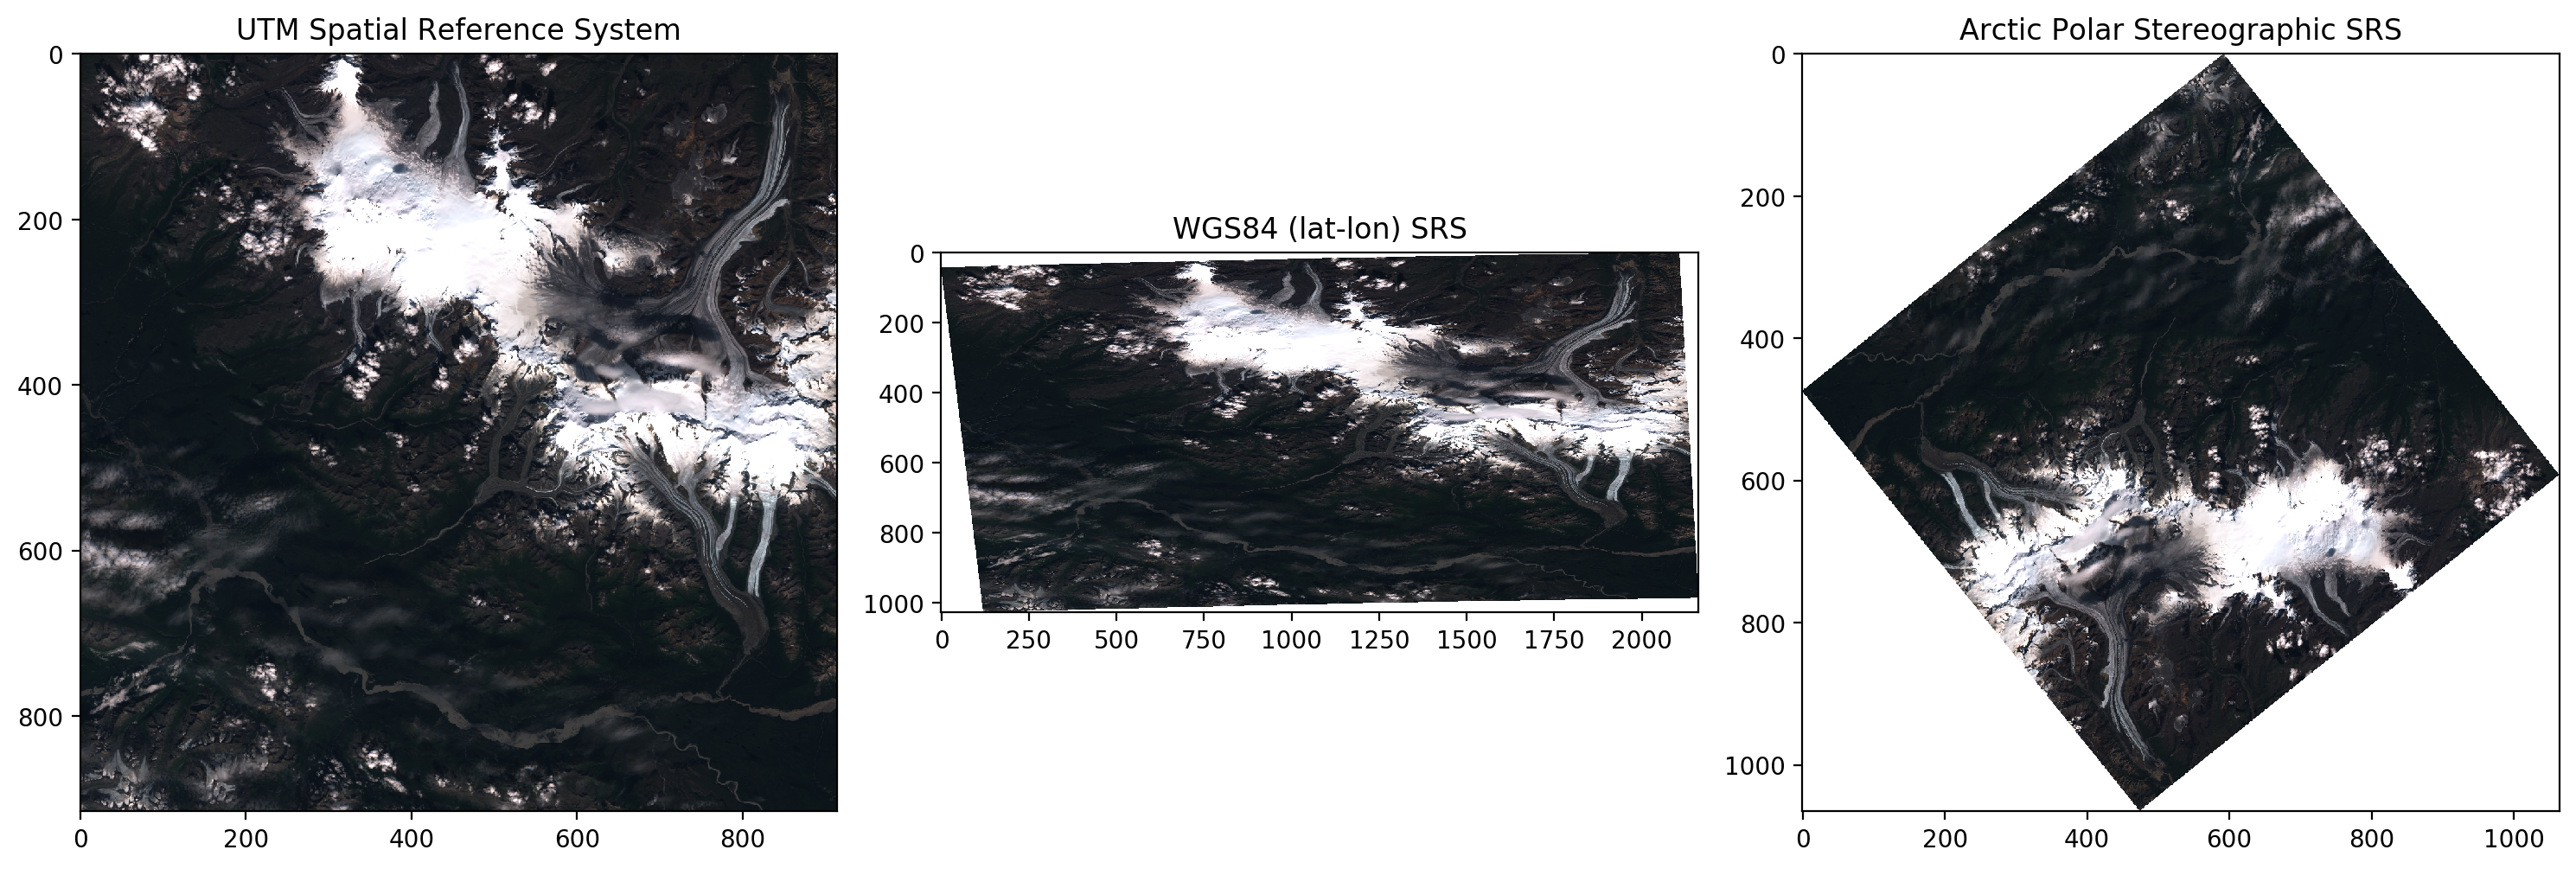 https://cdn.descarteslabs.com/docs/public/_images/raster_figure31_1.png